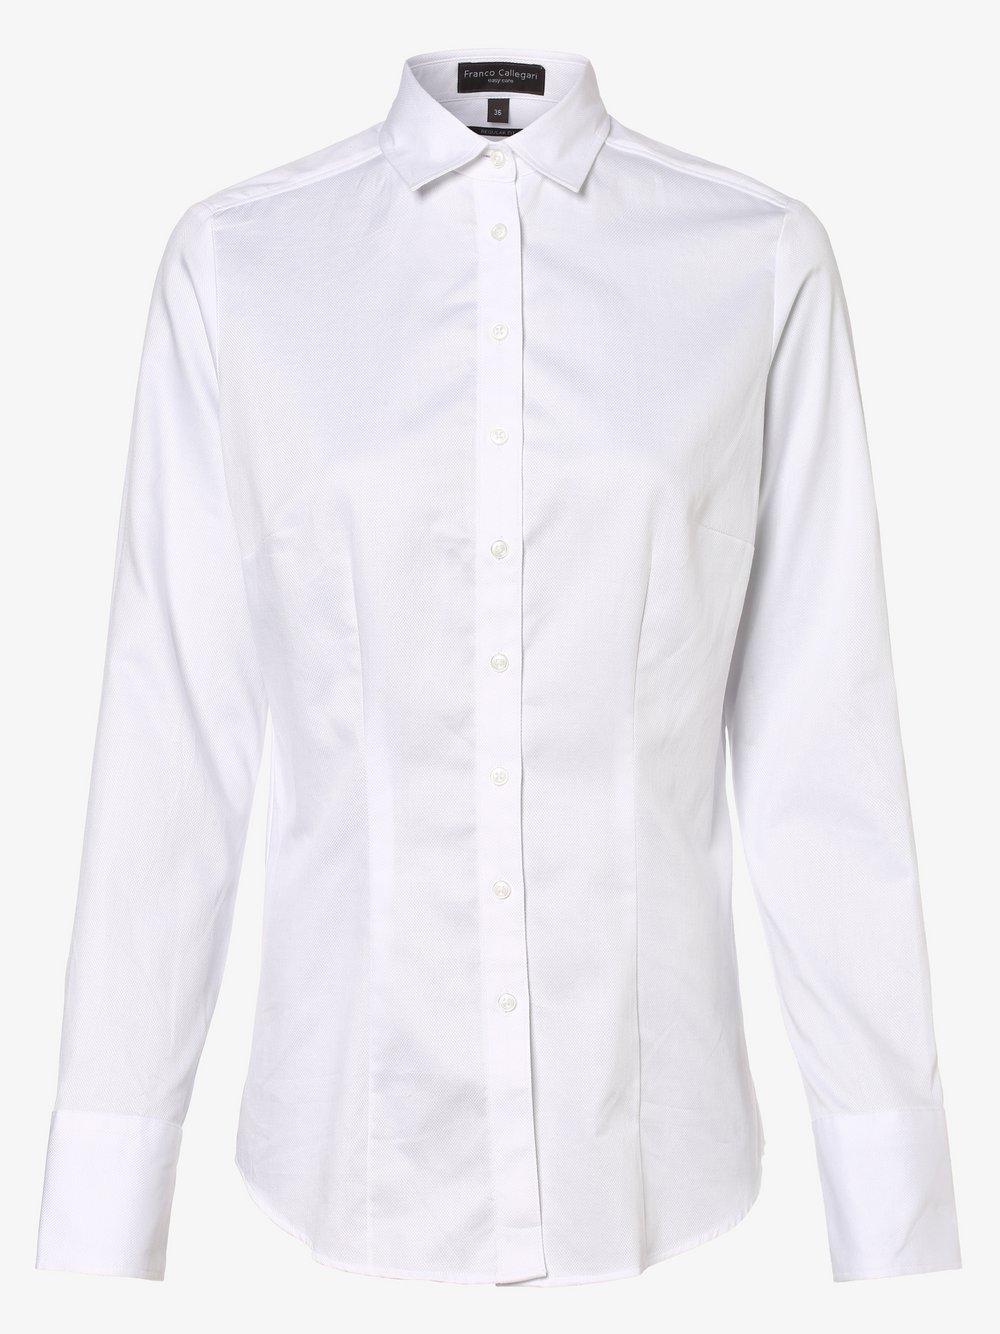 Franco Callegari – Bluzka damska, biały Van Graaf 331184-0020-00440